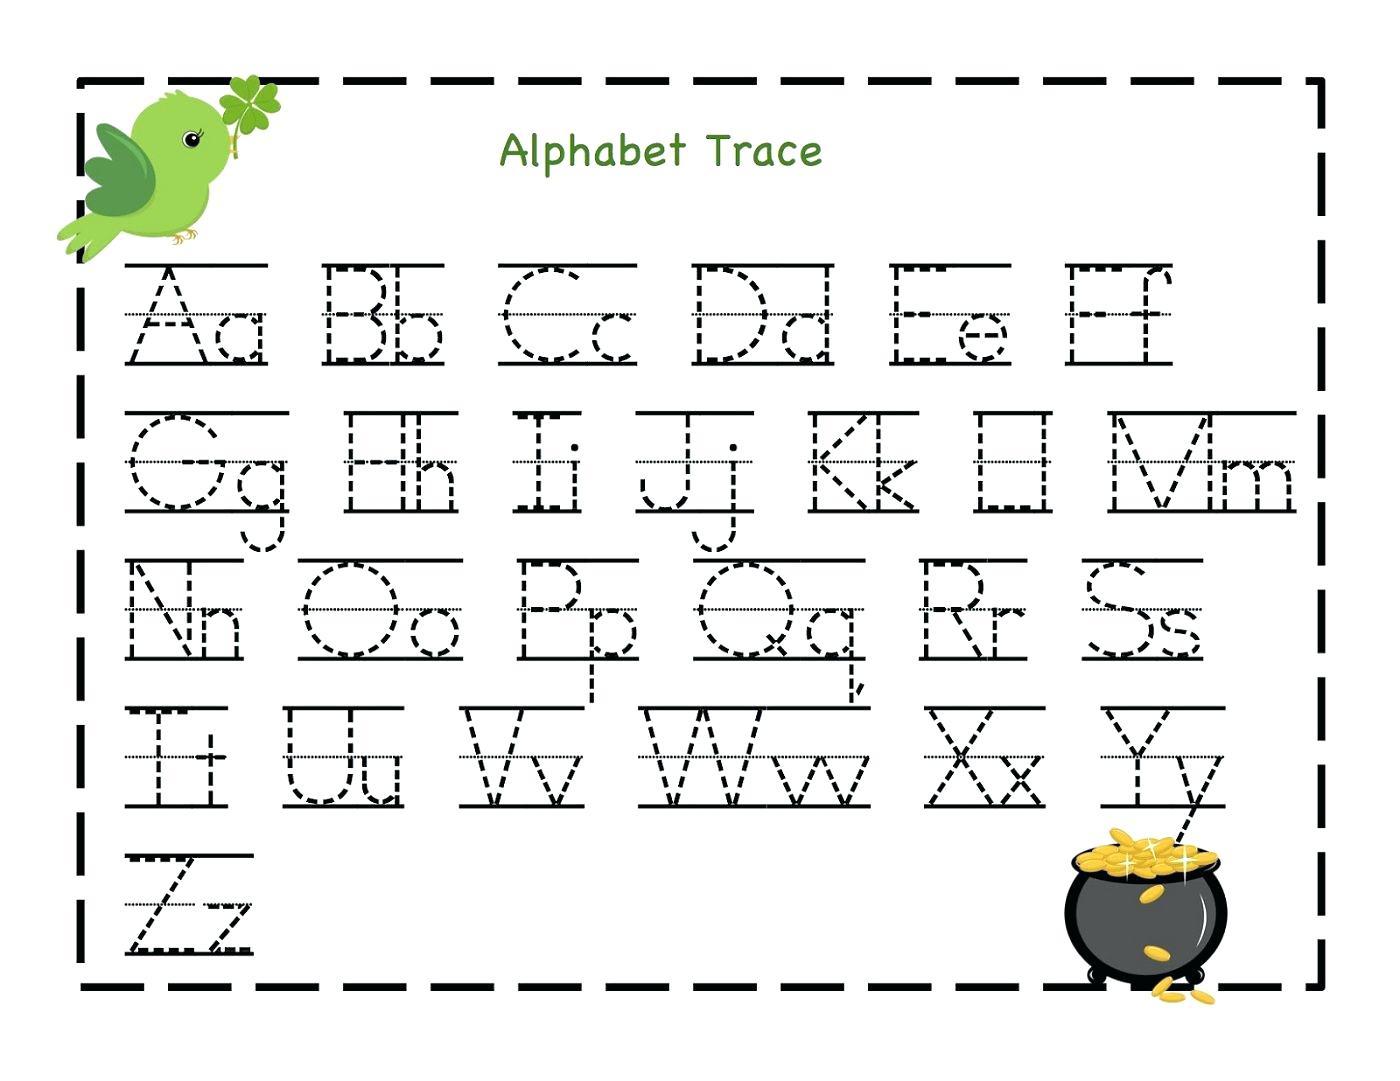 Letter Tracing Worksheets Uppercase And Lowercase Letters intended for Tracing Letter I Worksheets For Kindergarten